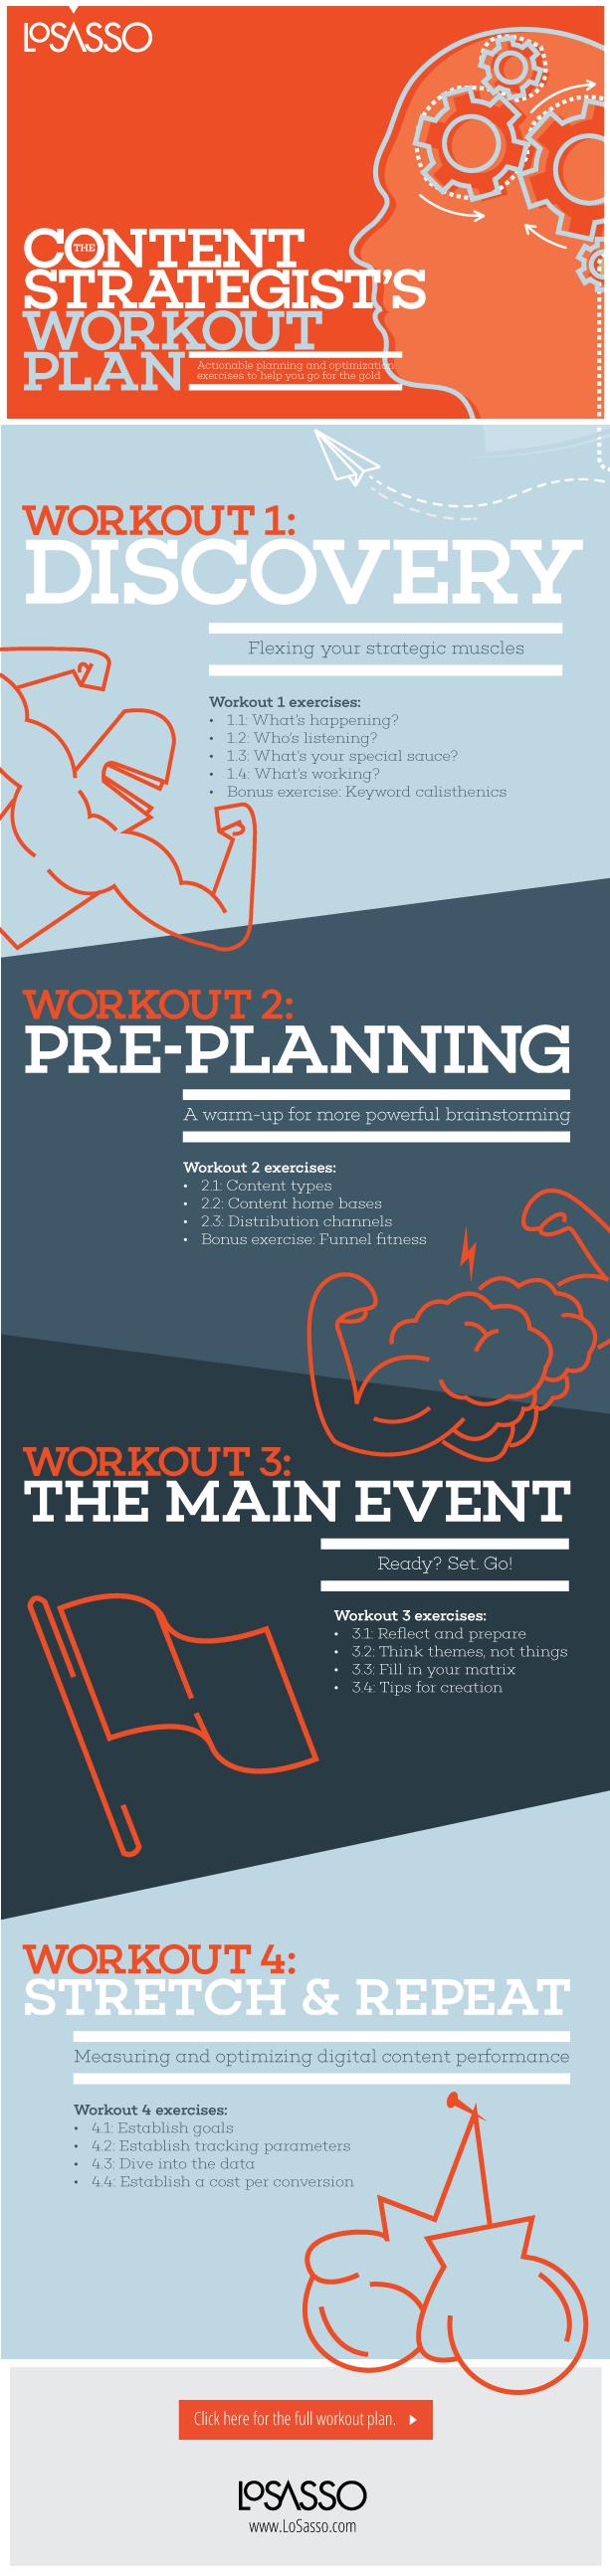 LoSasso Workbook Infographic